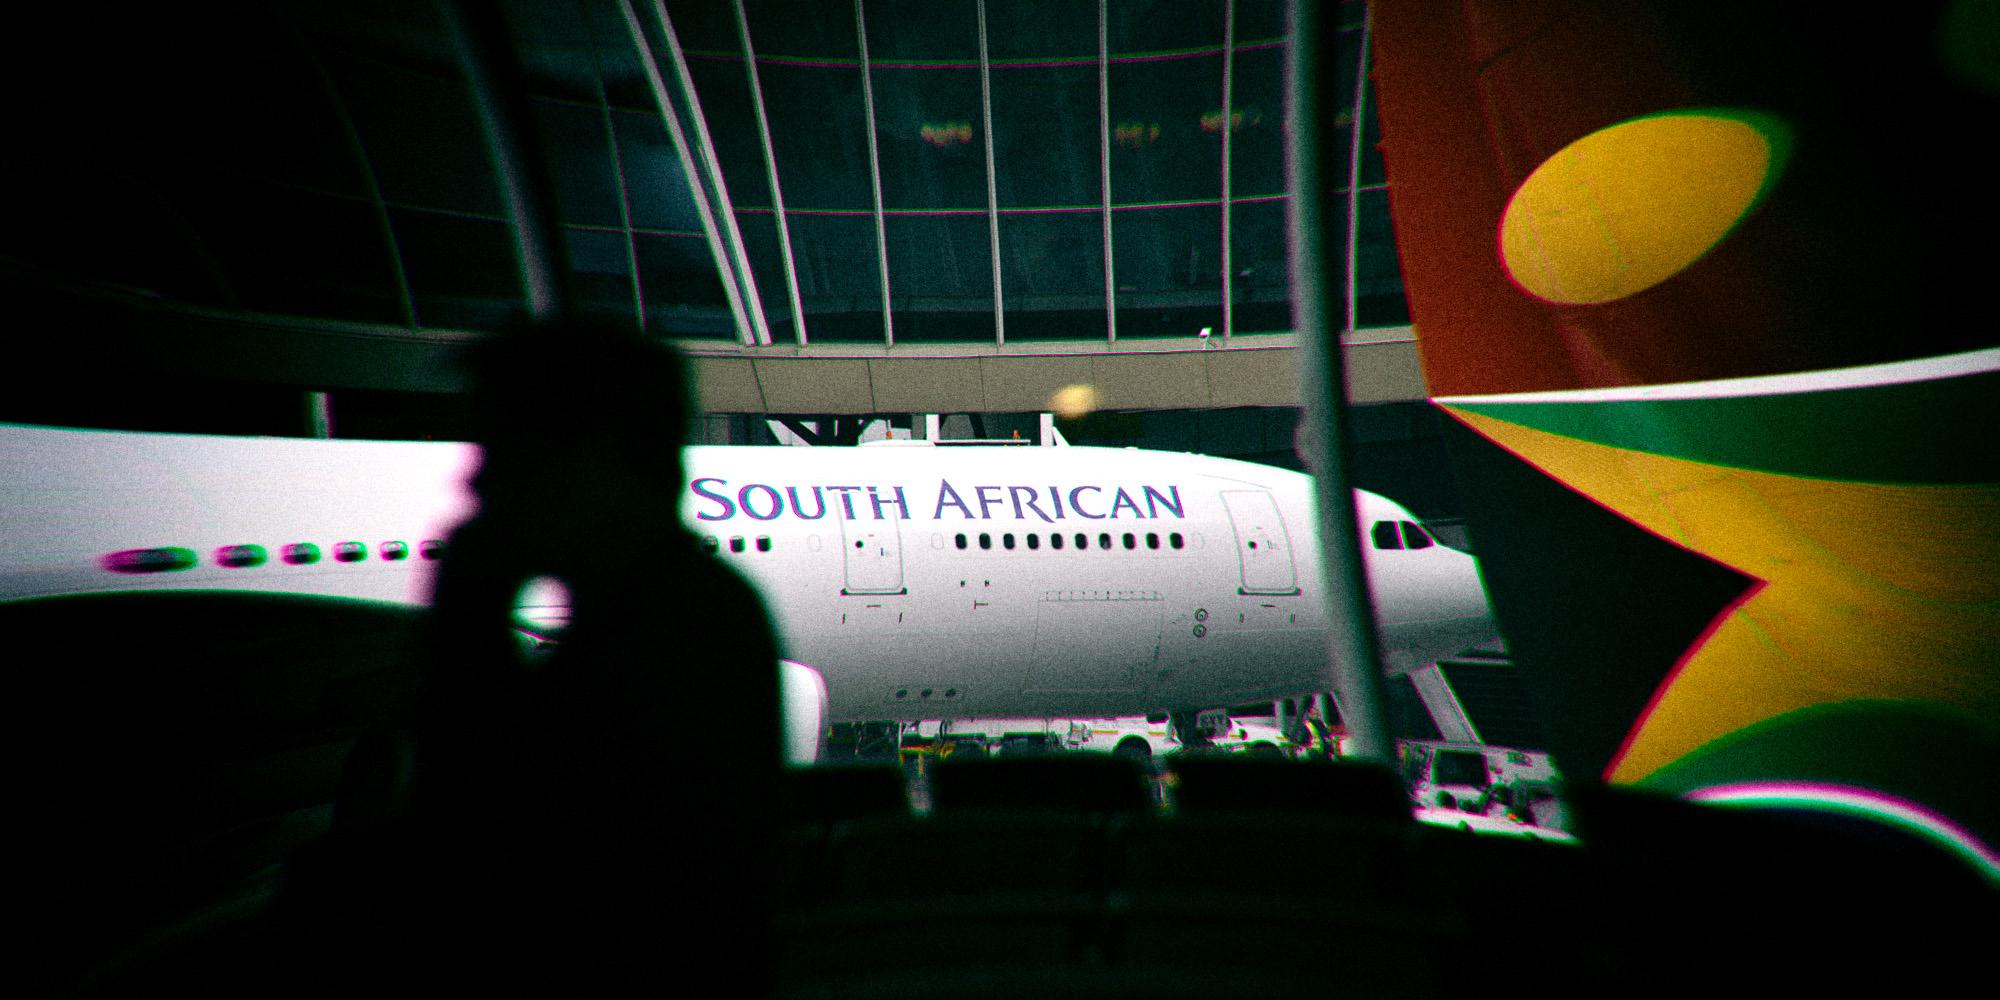 Treasury agrees to raise funding for new SAA - Daily Maverick